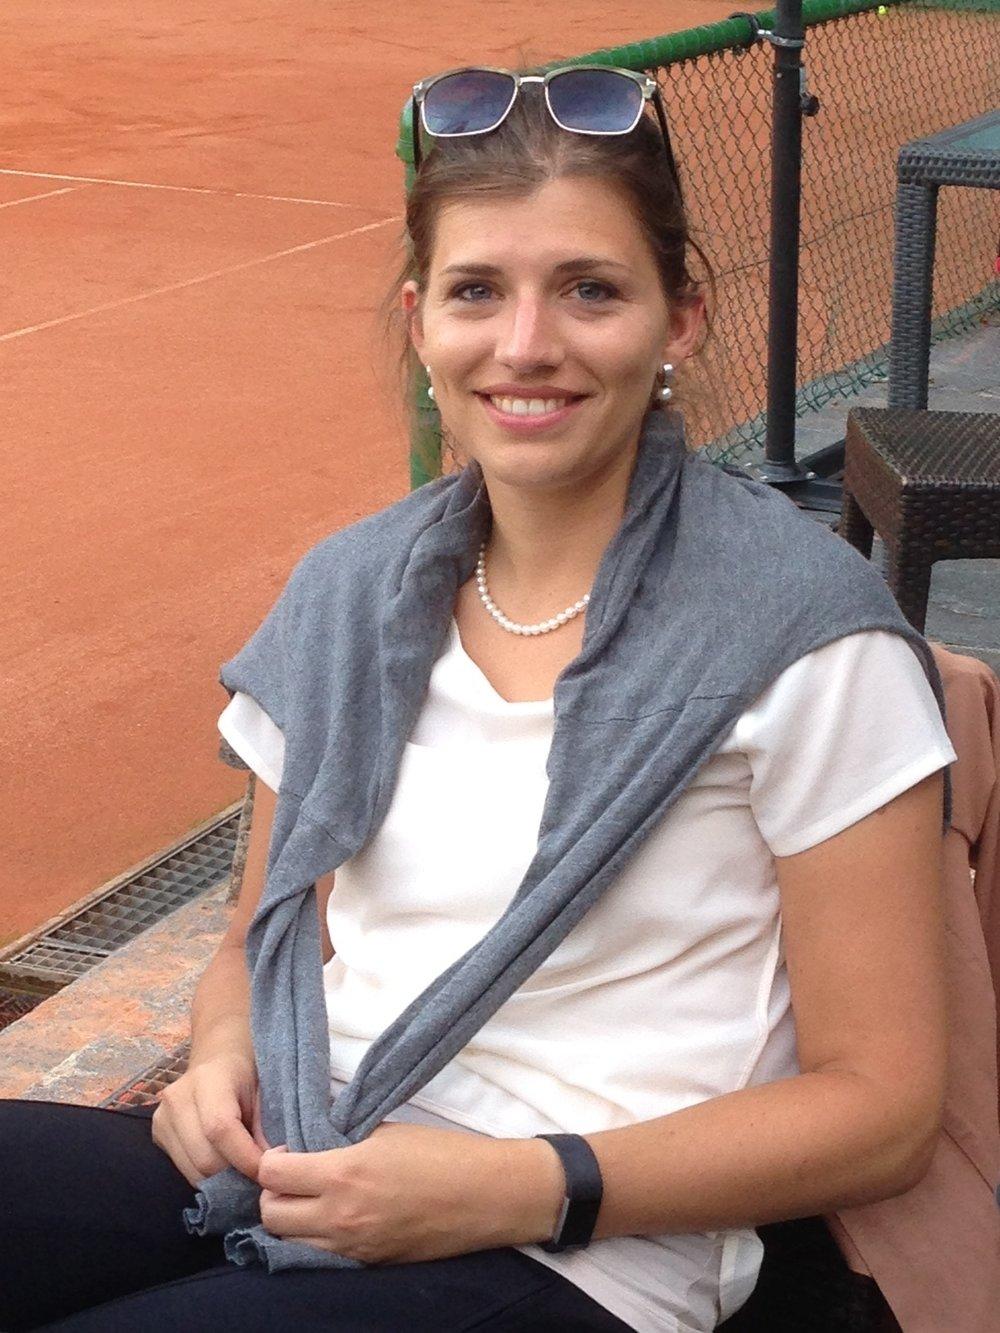 BLTC-Clubmeisterin 2017 Tamara Murer.